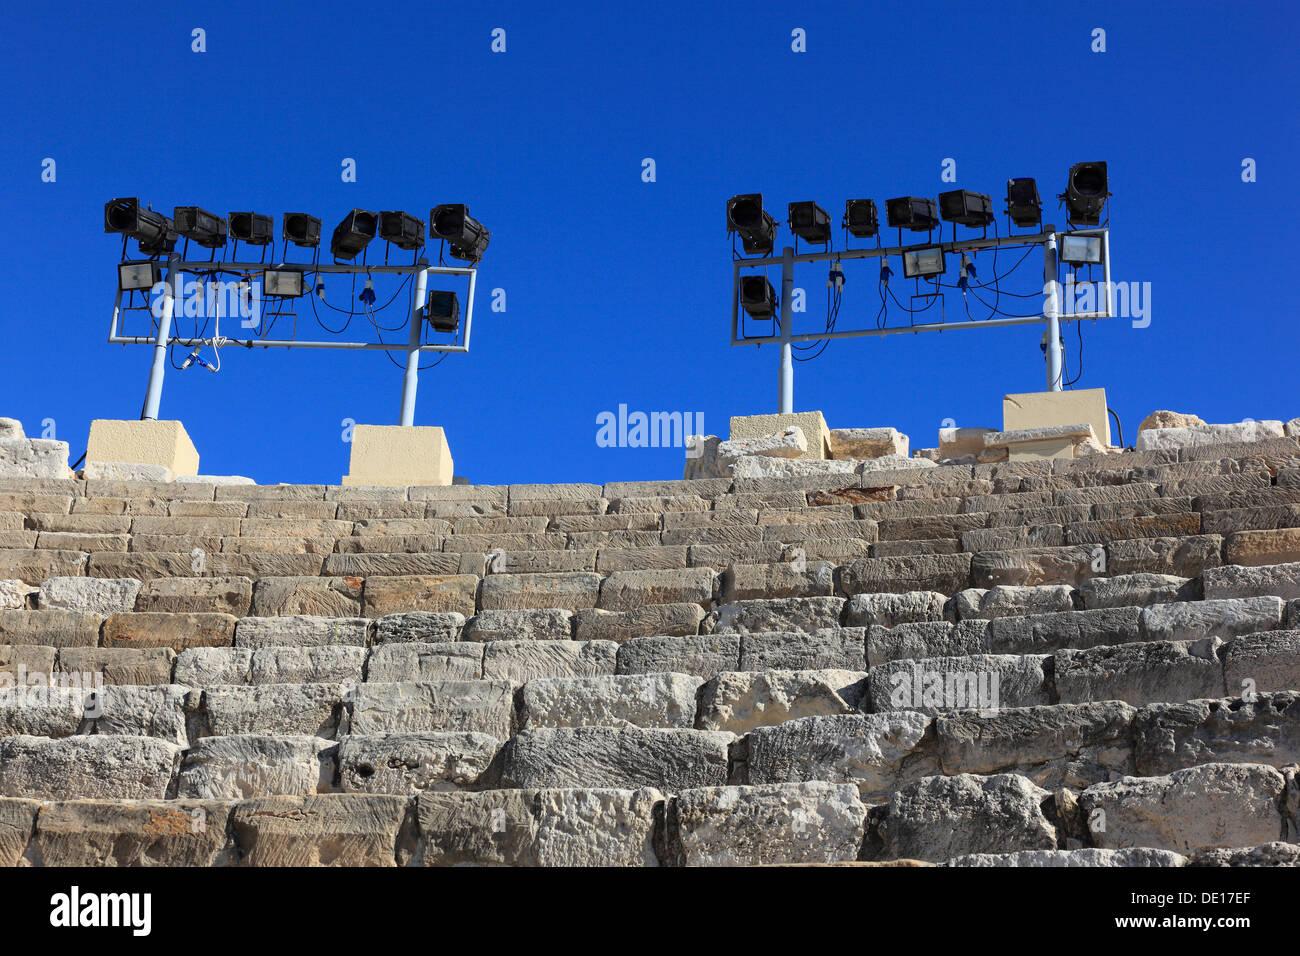 Cyprus, Kourion, Assyrian Ku-ri-i, ancient Greek, Latin, curium, historical, ancient archaeological site, ruins, roman theater - Stock Image